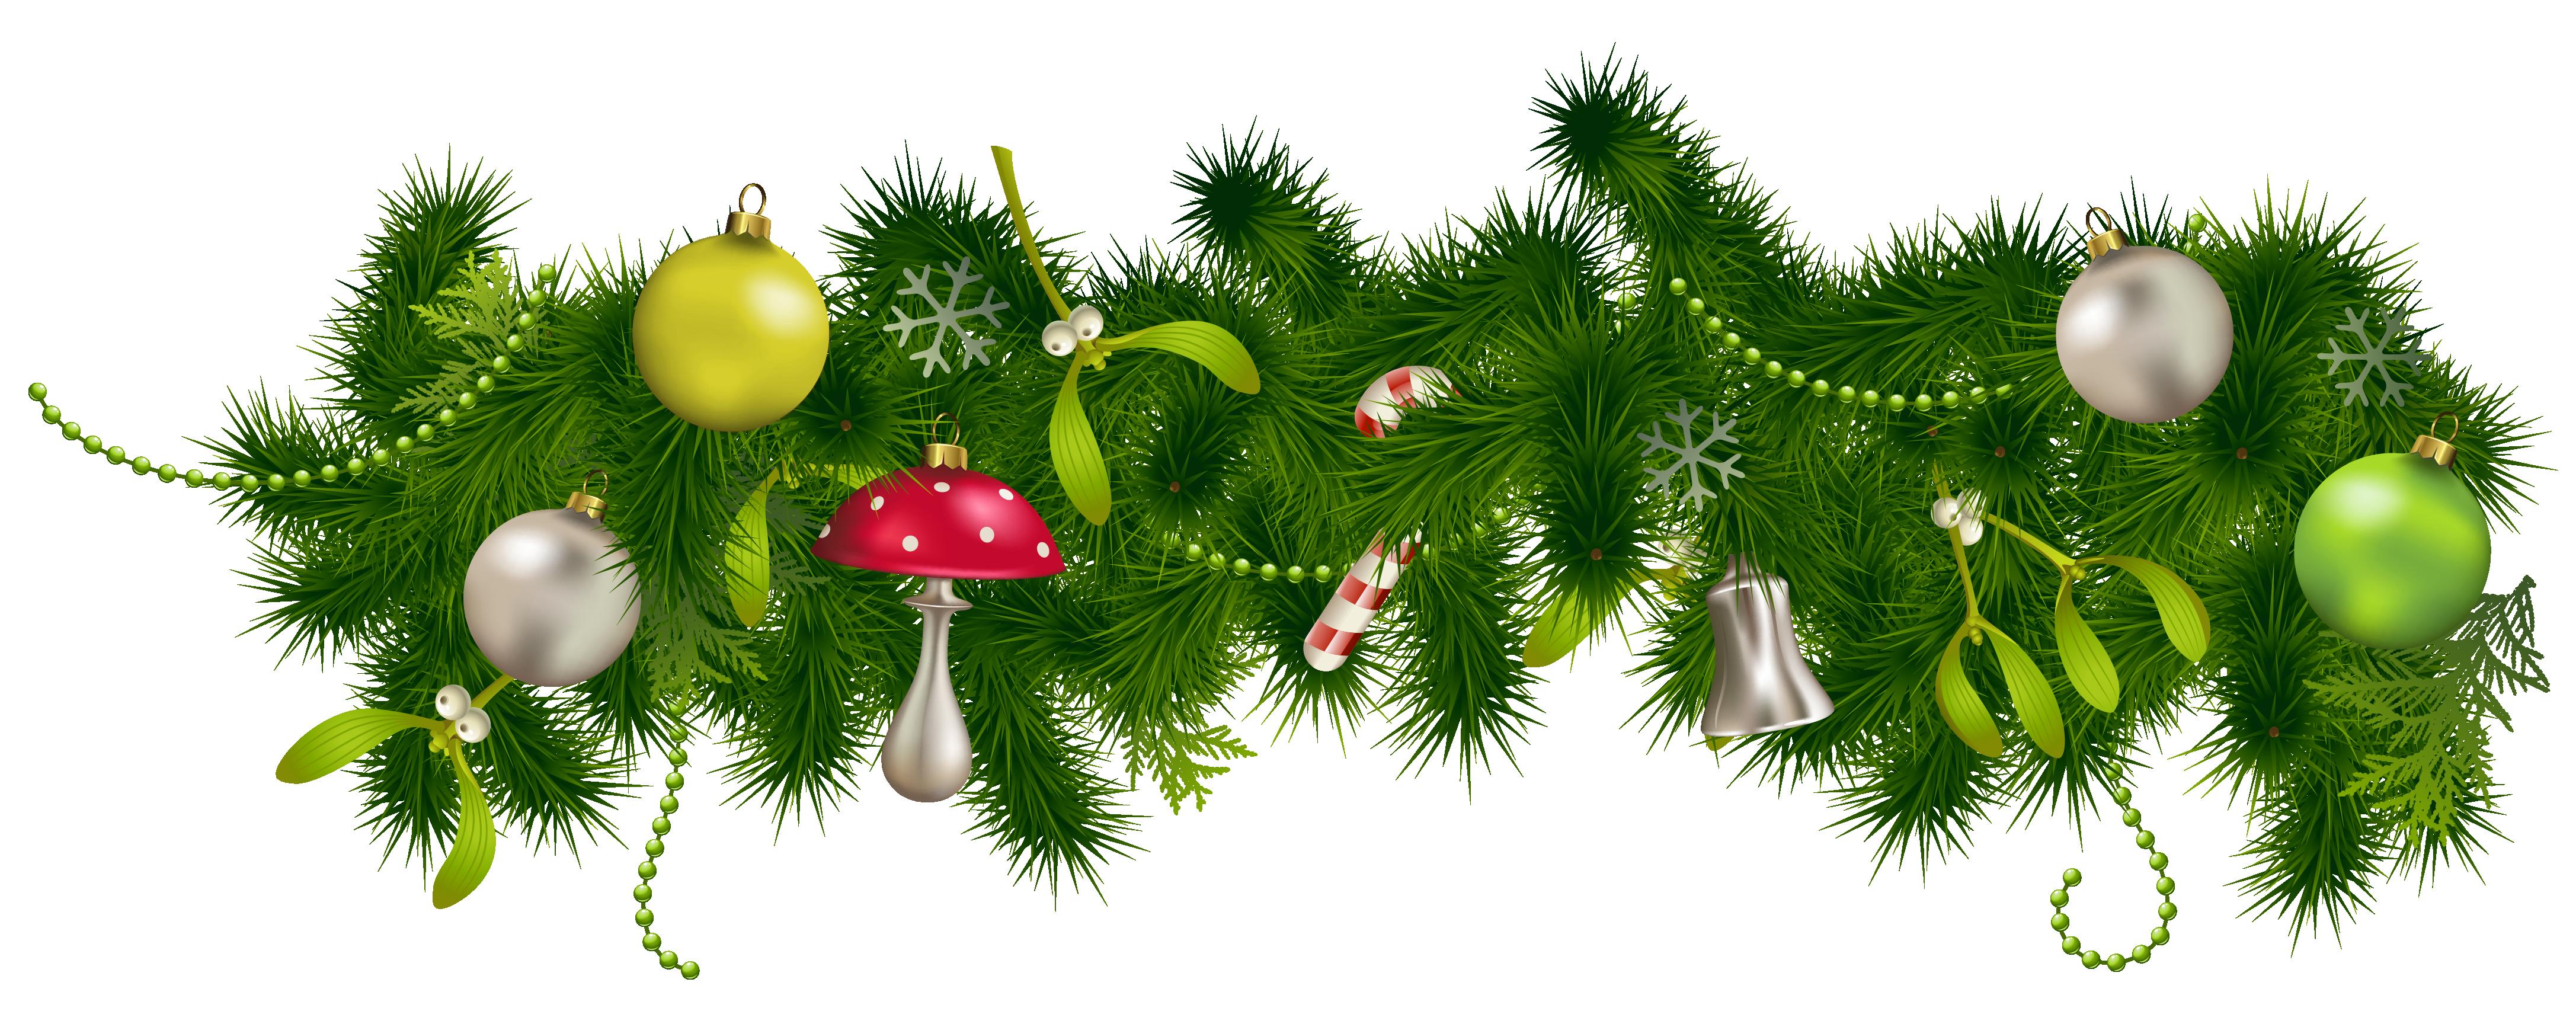 ornament clipart huge. Christmas garland border png